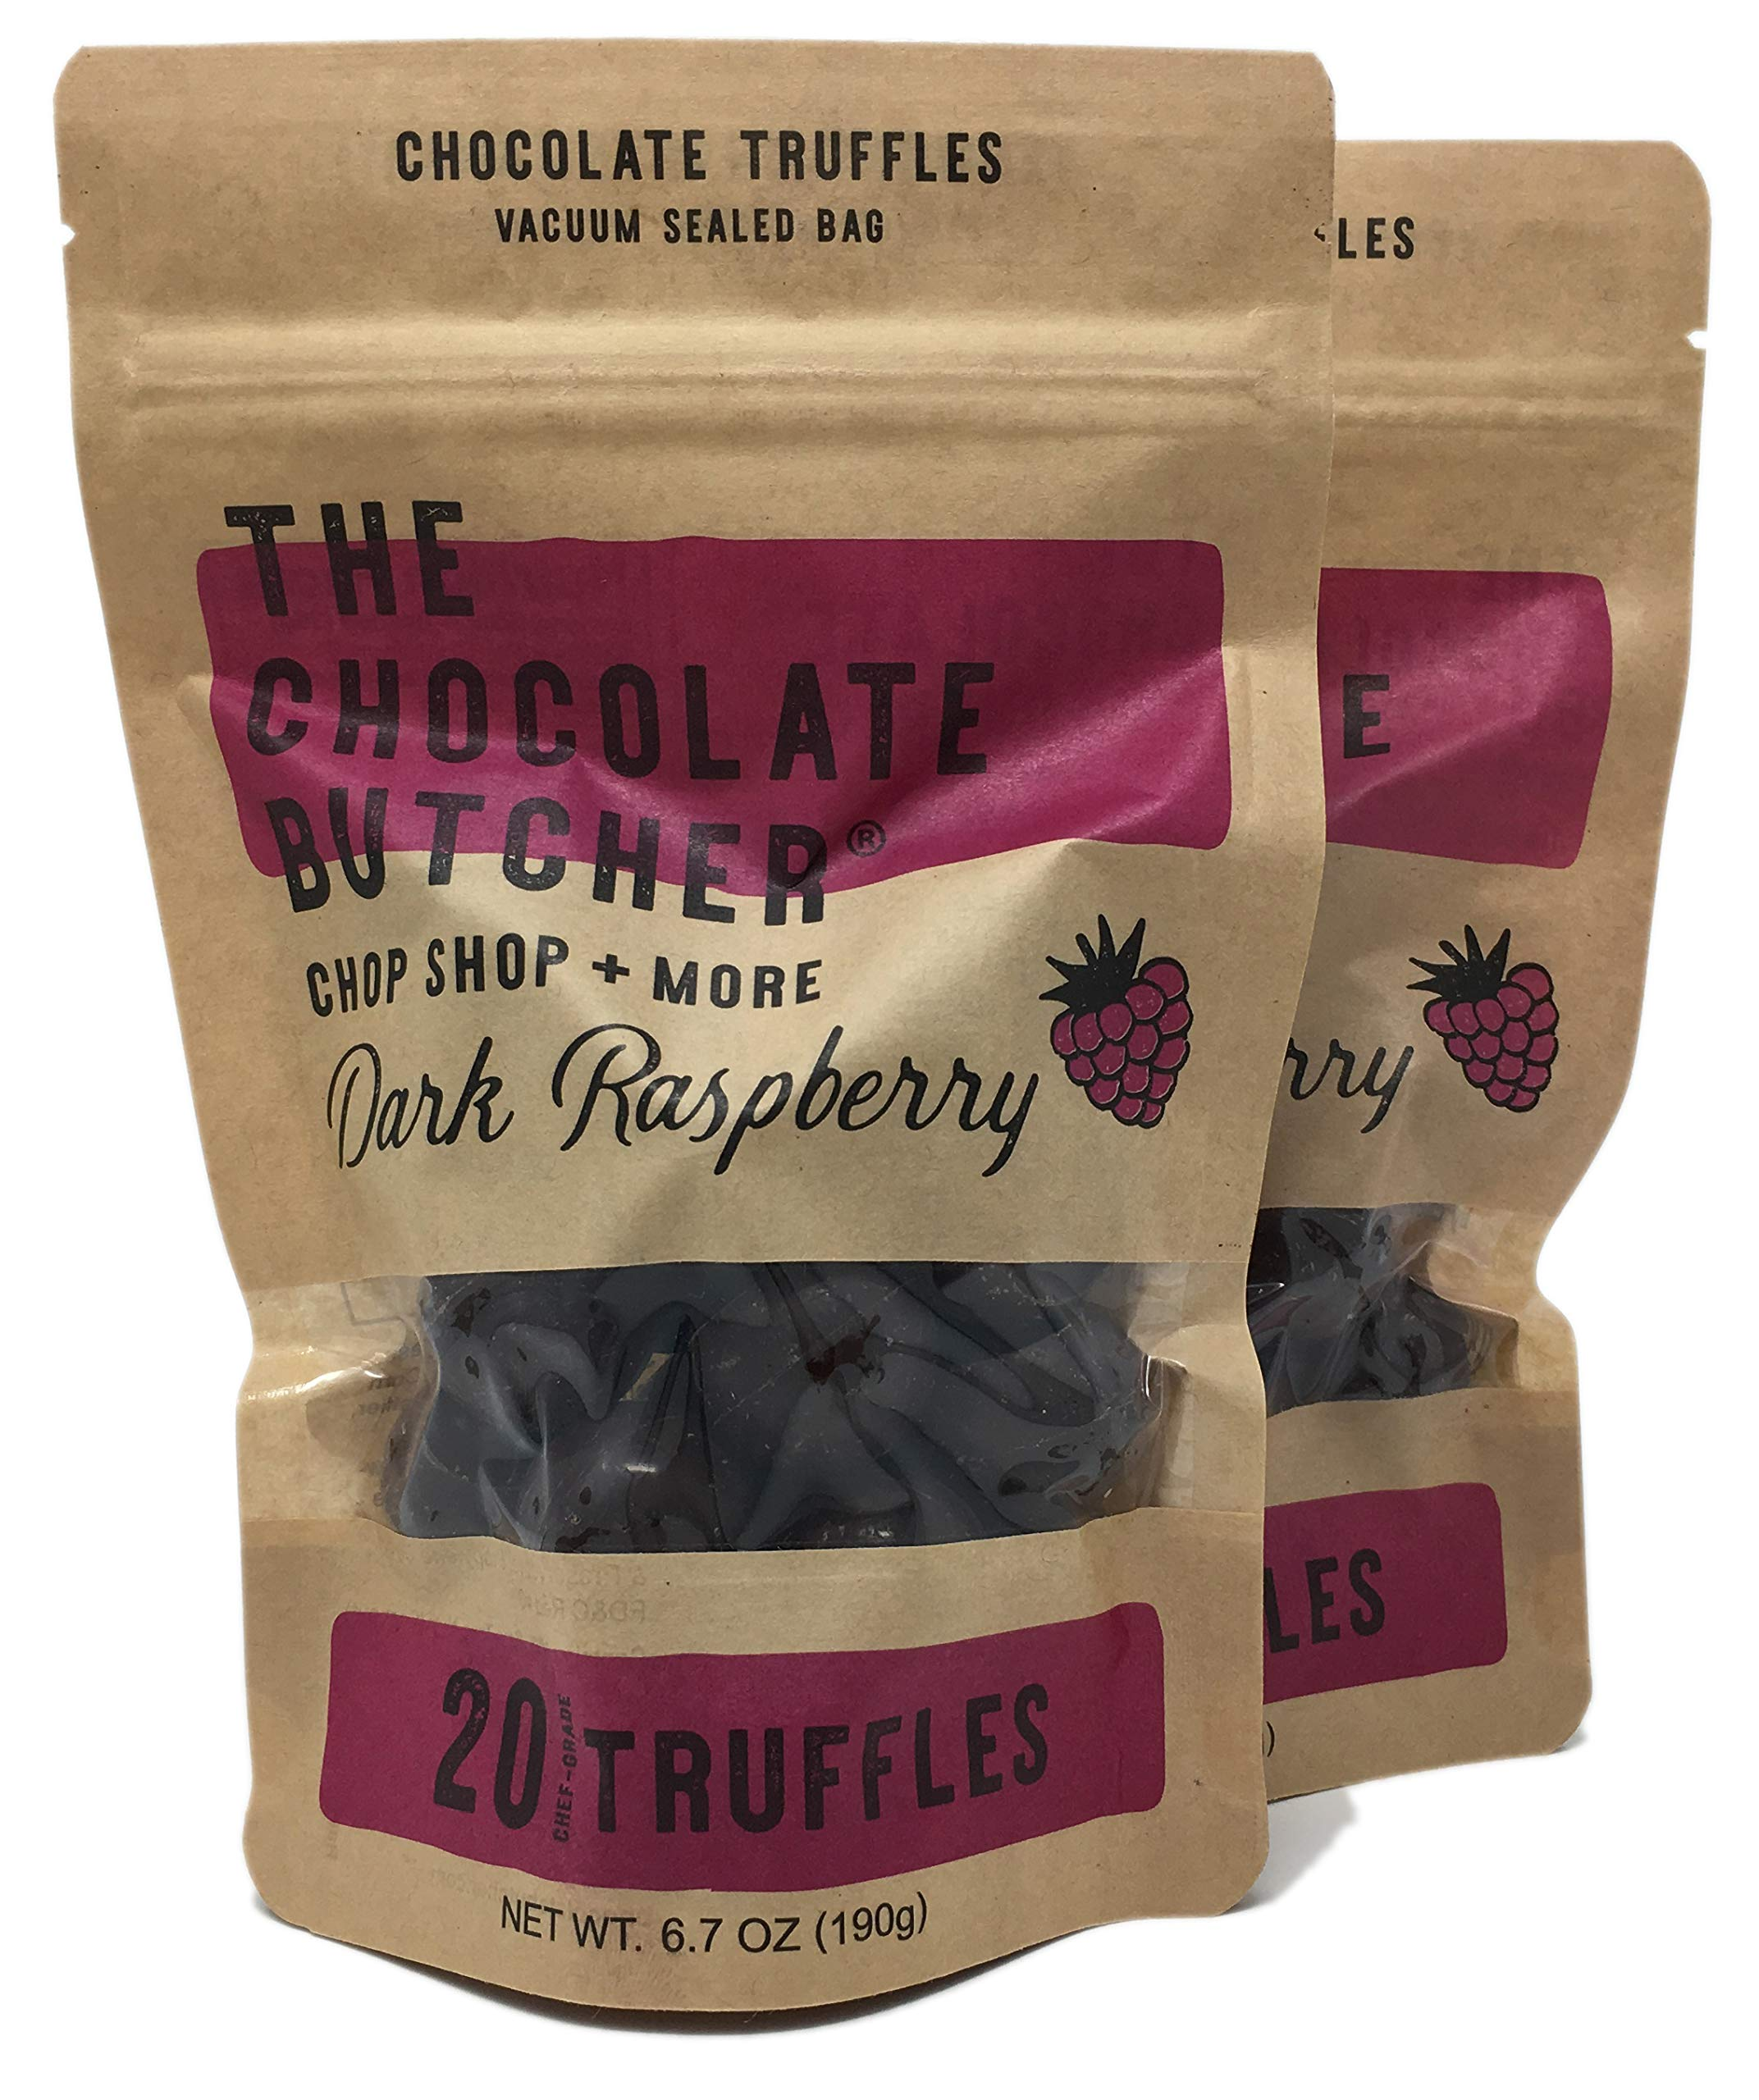 Chef-Grade Raspberry Dark Chocolate Truffles (Two Bags-40 Truffles) by The Chocolate Butcher